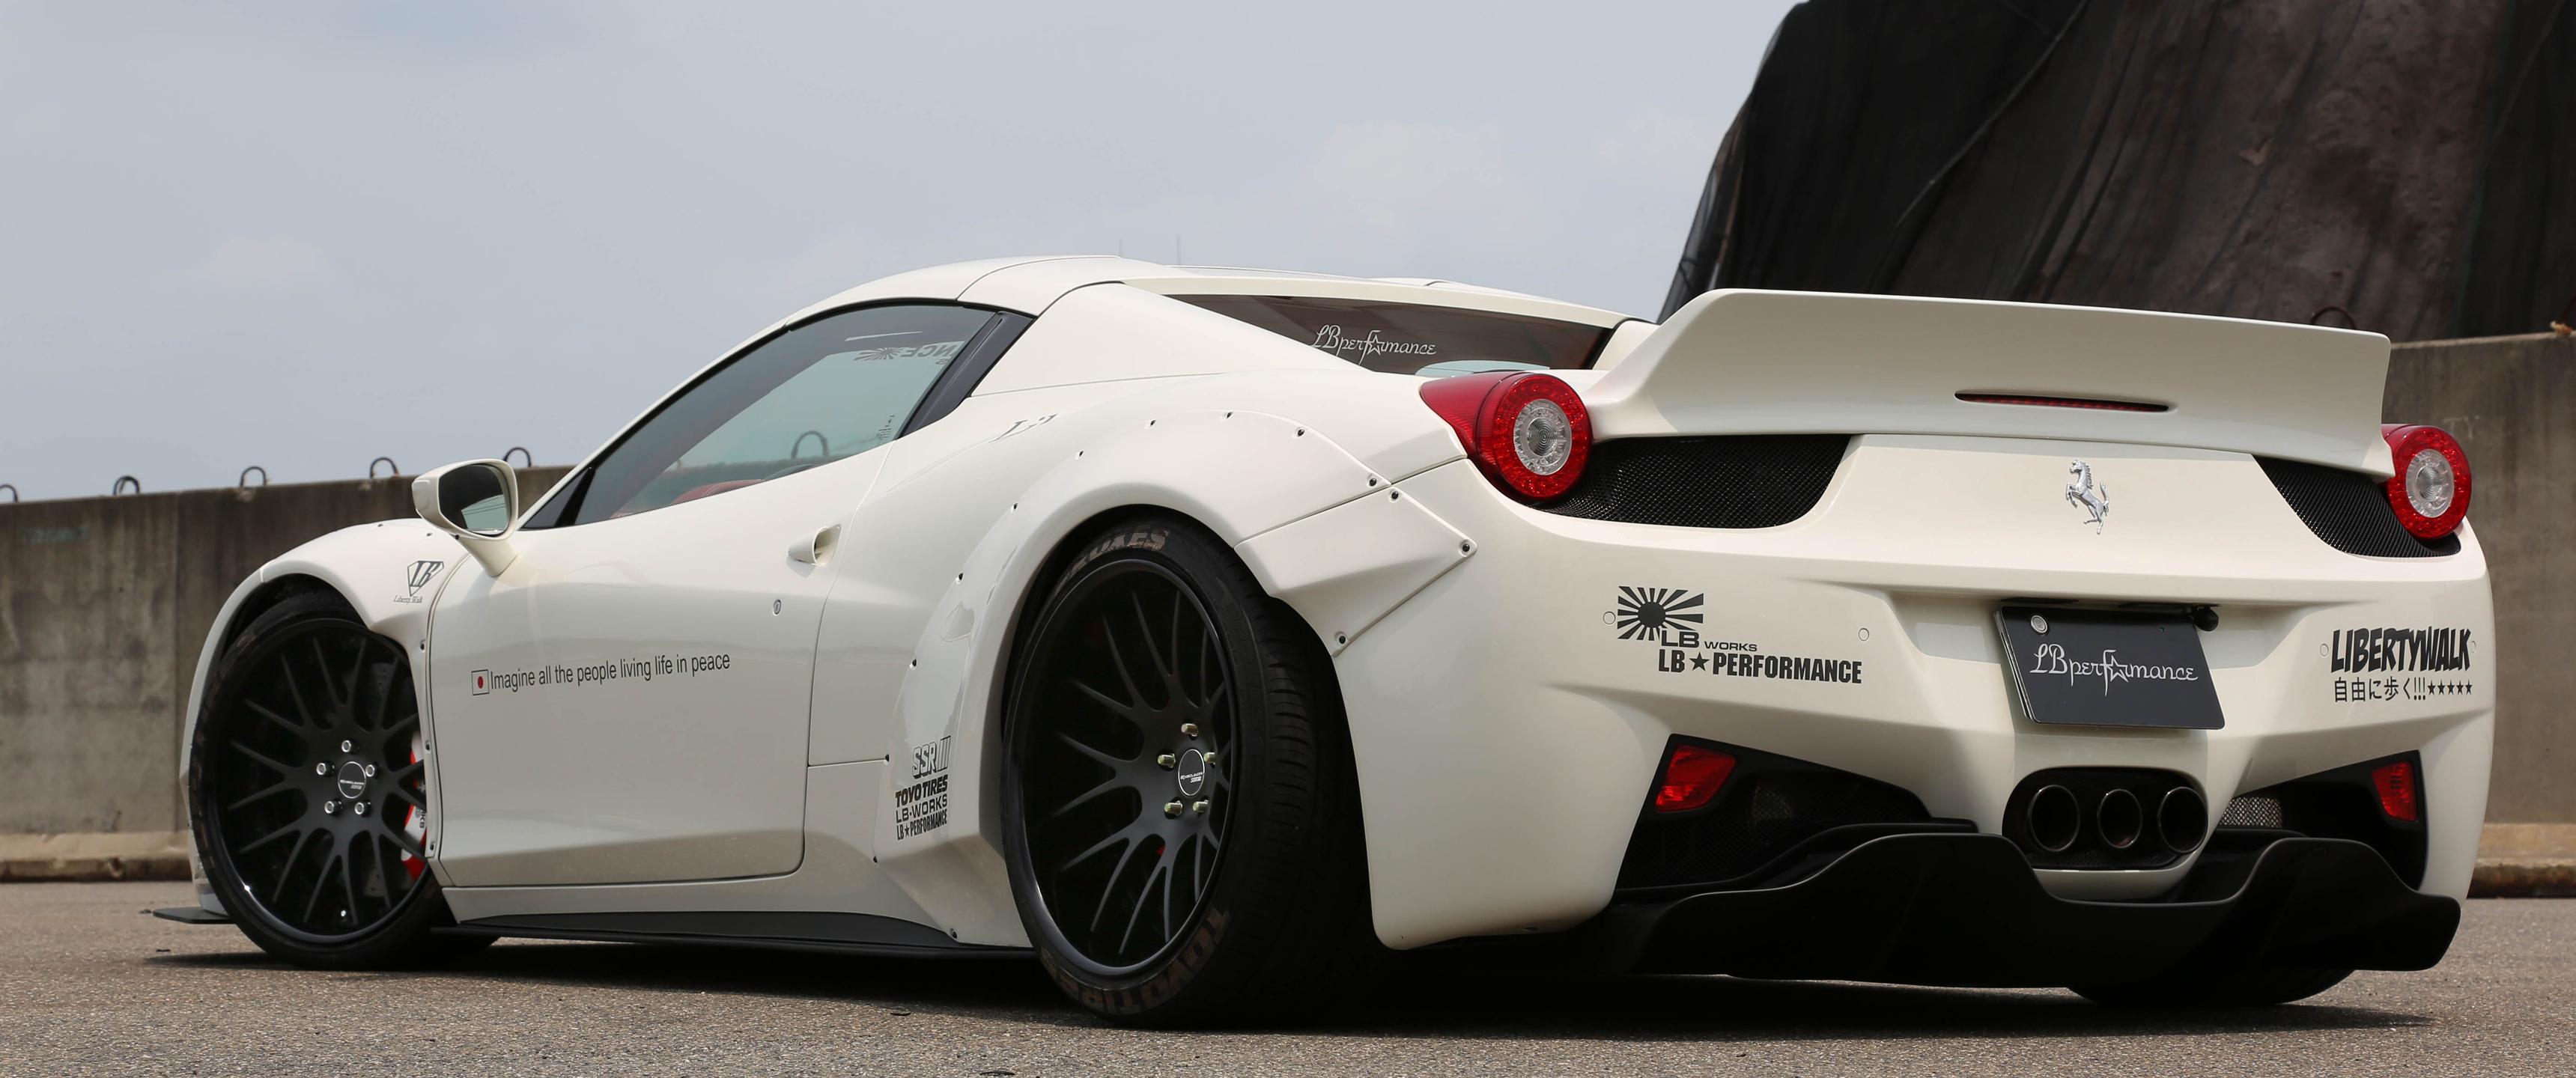 Ferrari 458 Spider Lb 3440x1440 Wallpaper Teahub Io